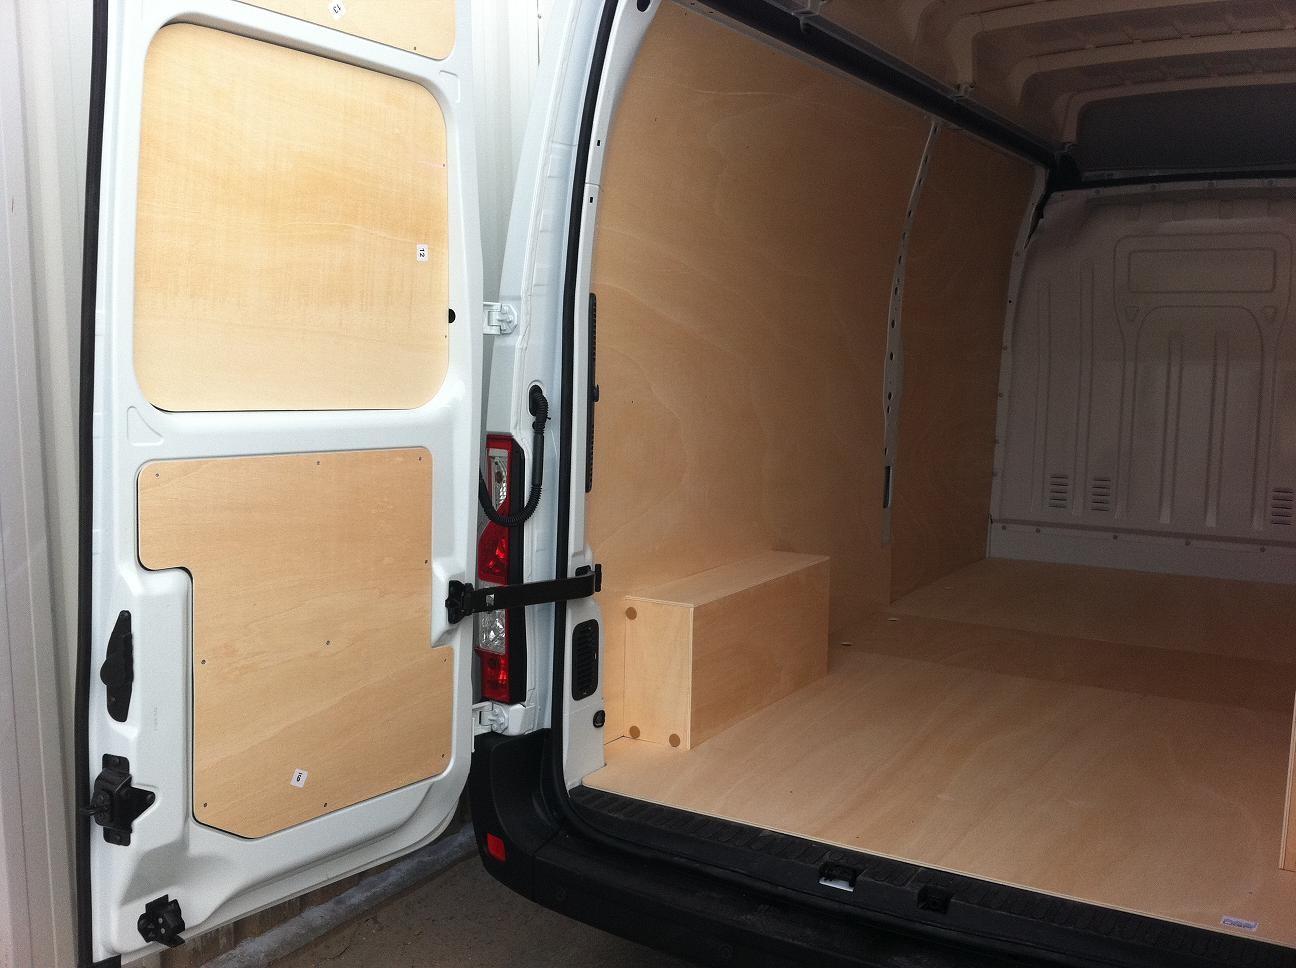 nos 4 kits bois contact auto am nagement utilitaires habillage protection. Black Bedroom Furniture Sets. Home Design Ideas